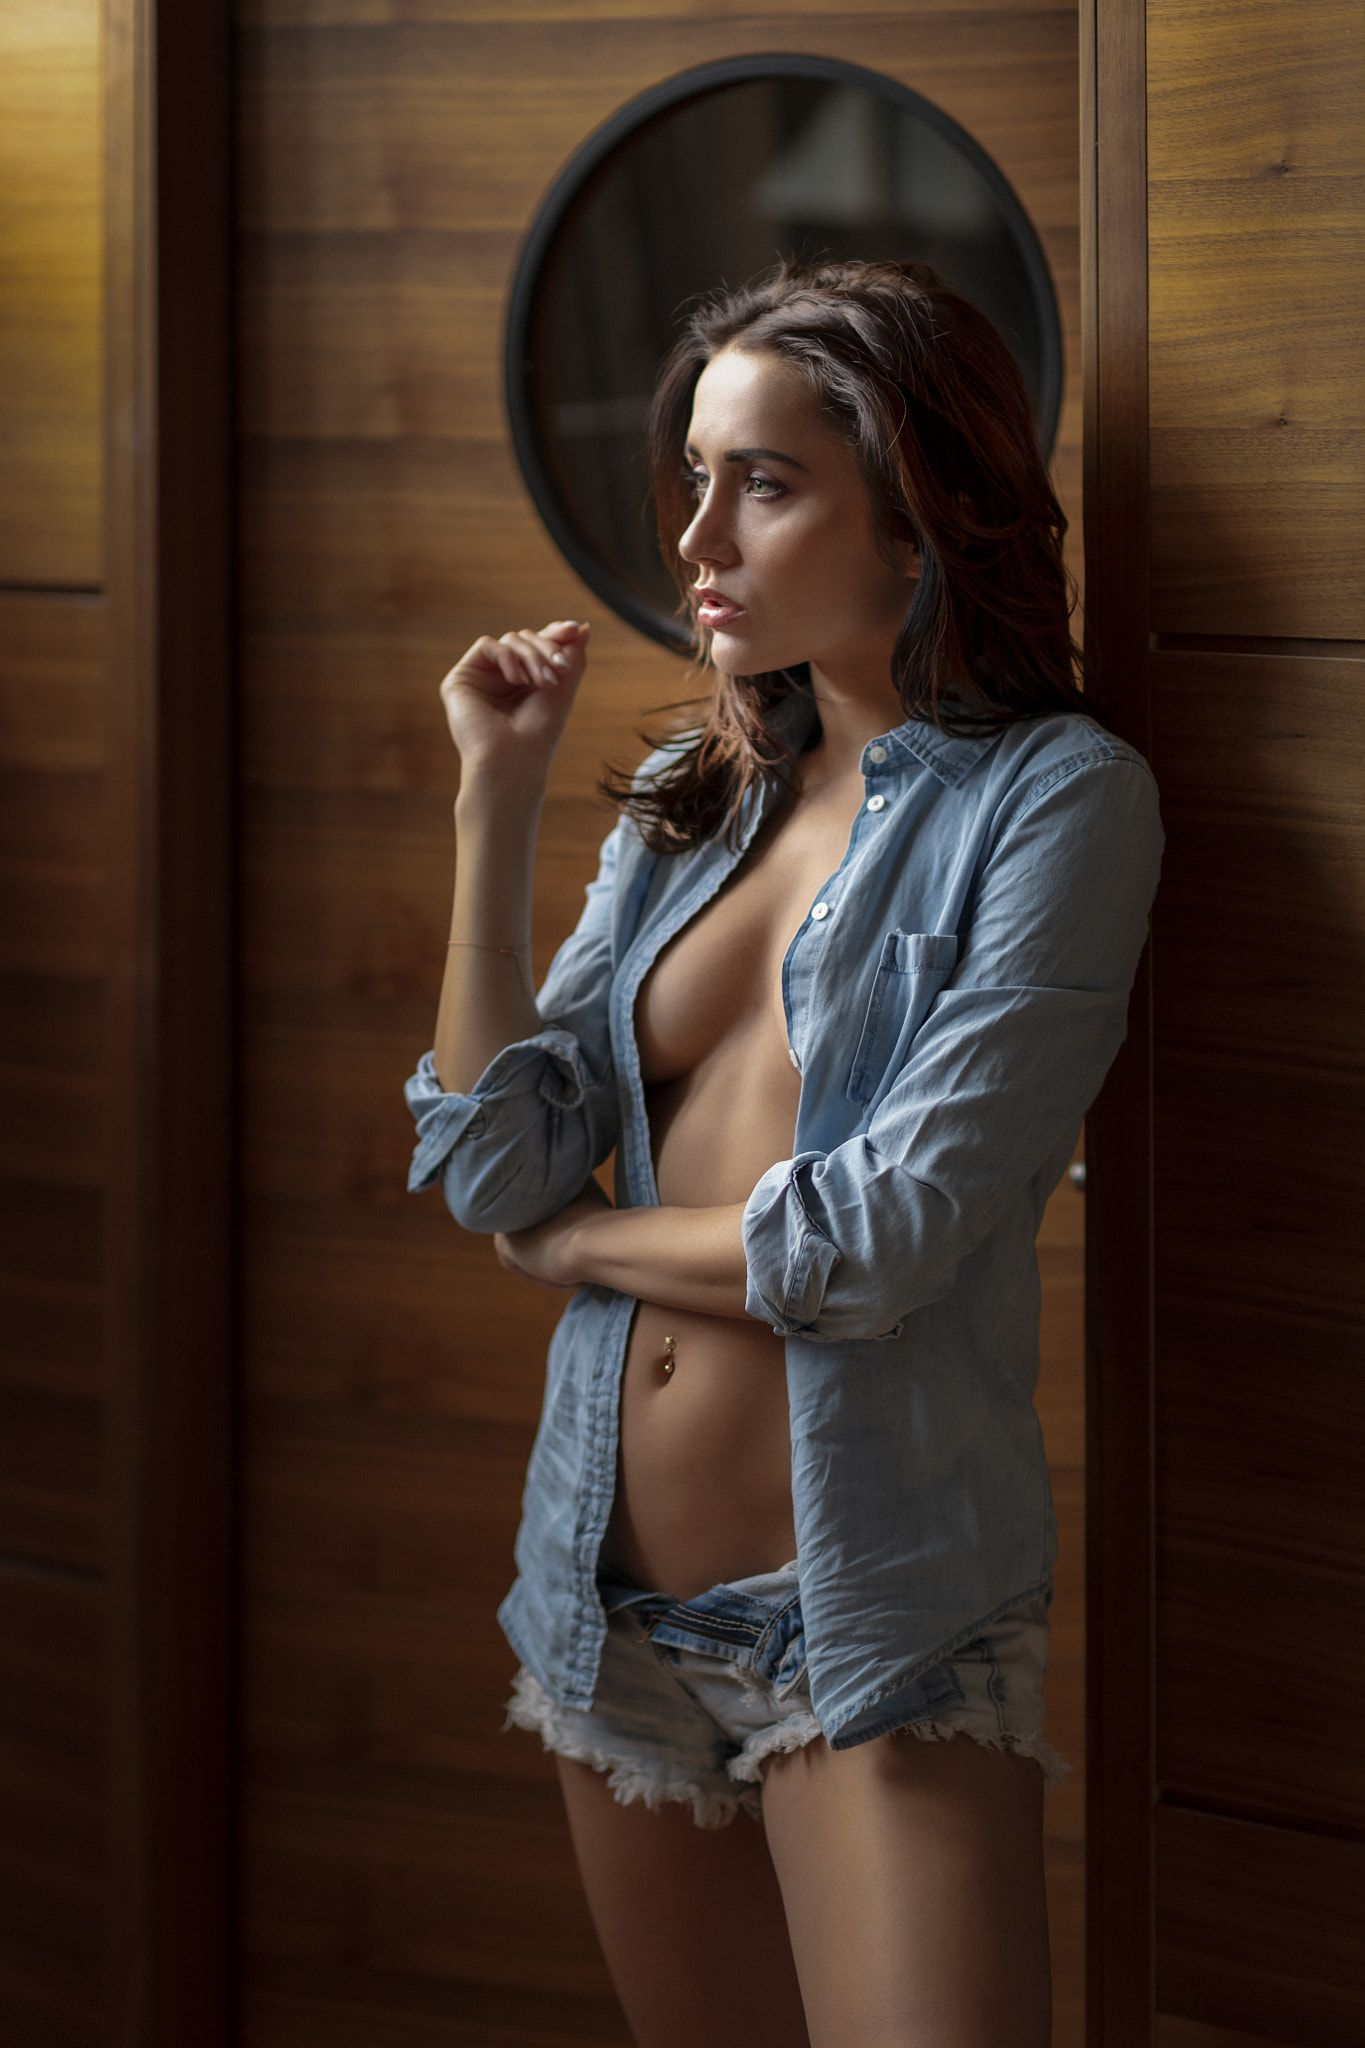 Anastasiya Avilova nude (53 fotos), pics Sideboobs, Snapchat, see through 2019